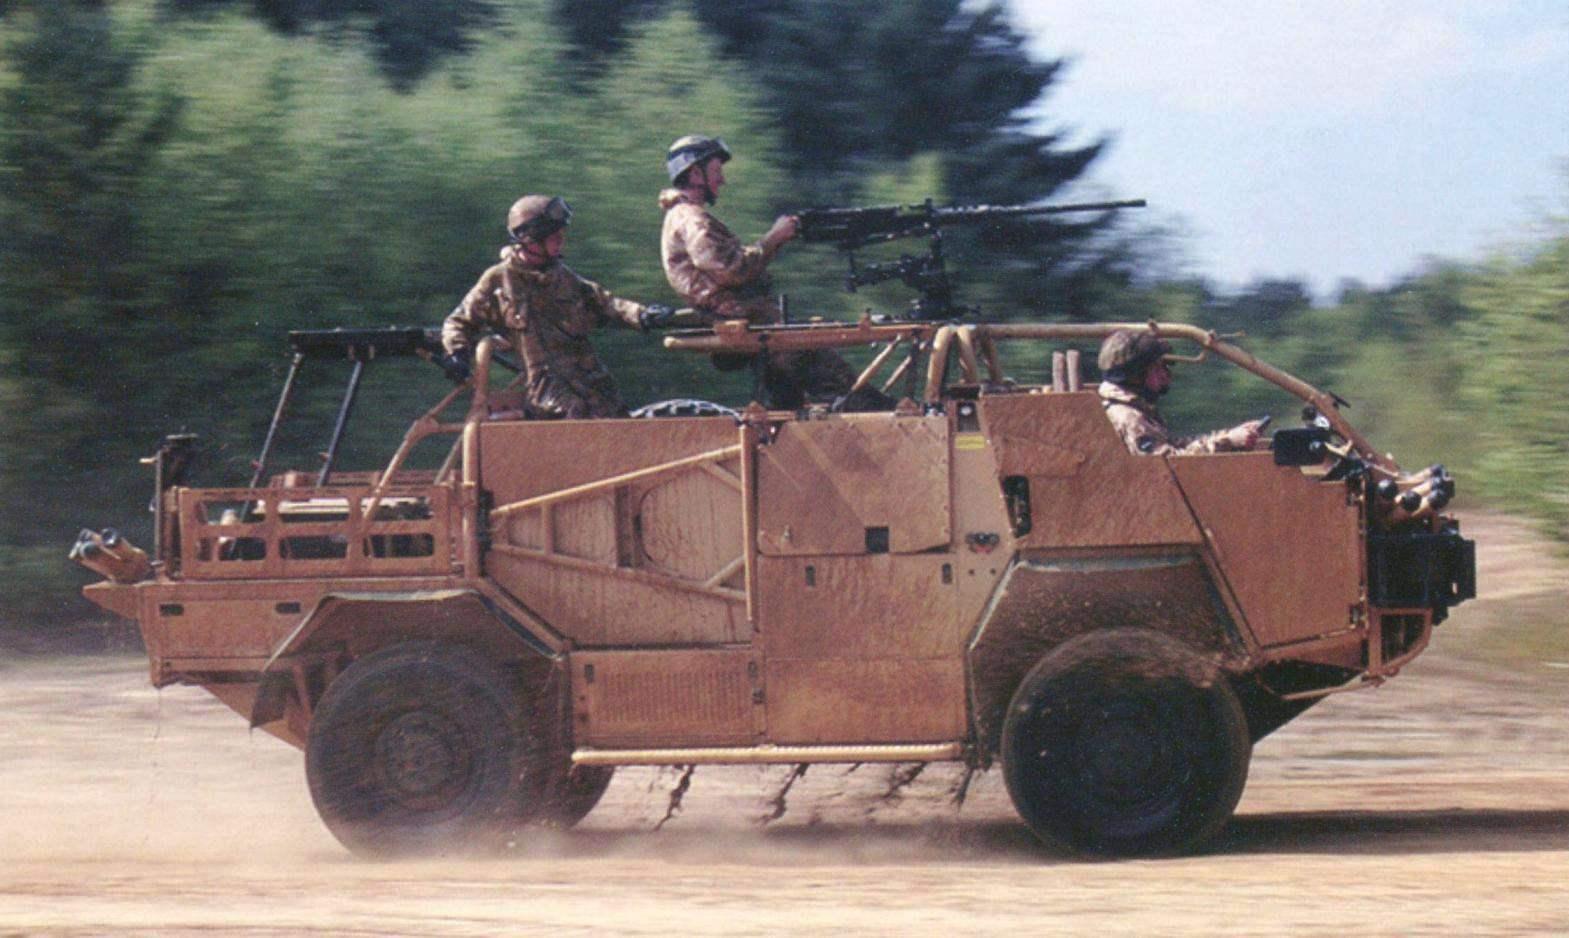 Armored patrol 400 Supacat Jackal 2A. British base